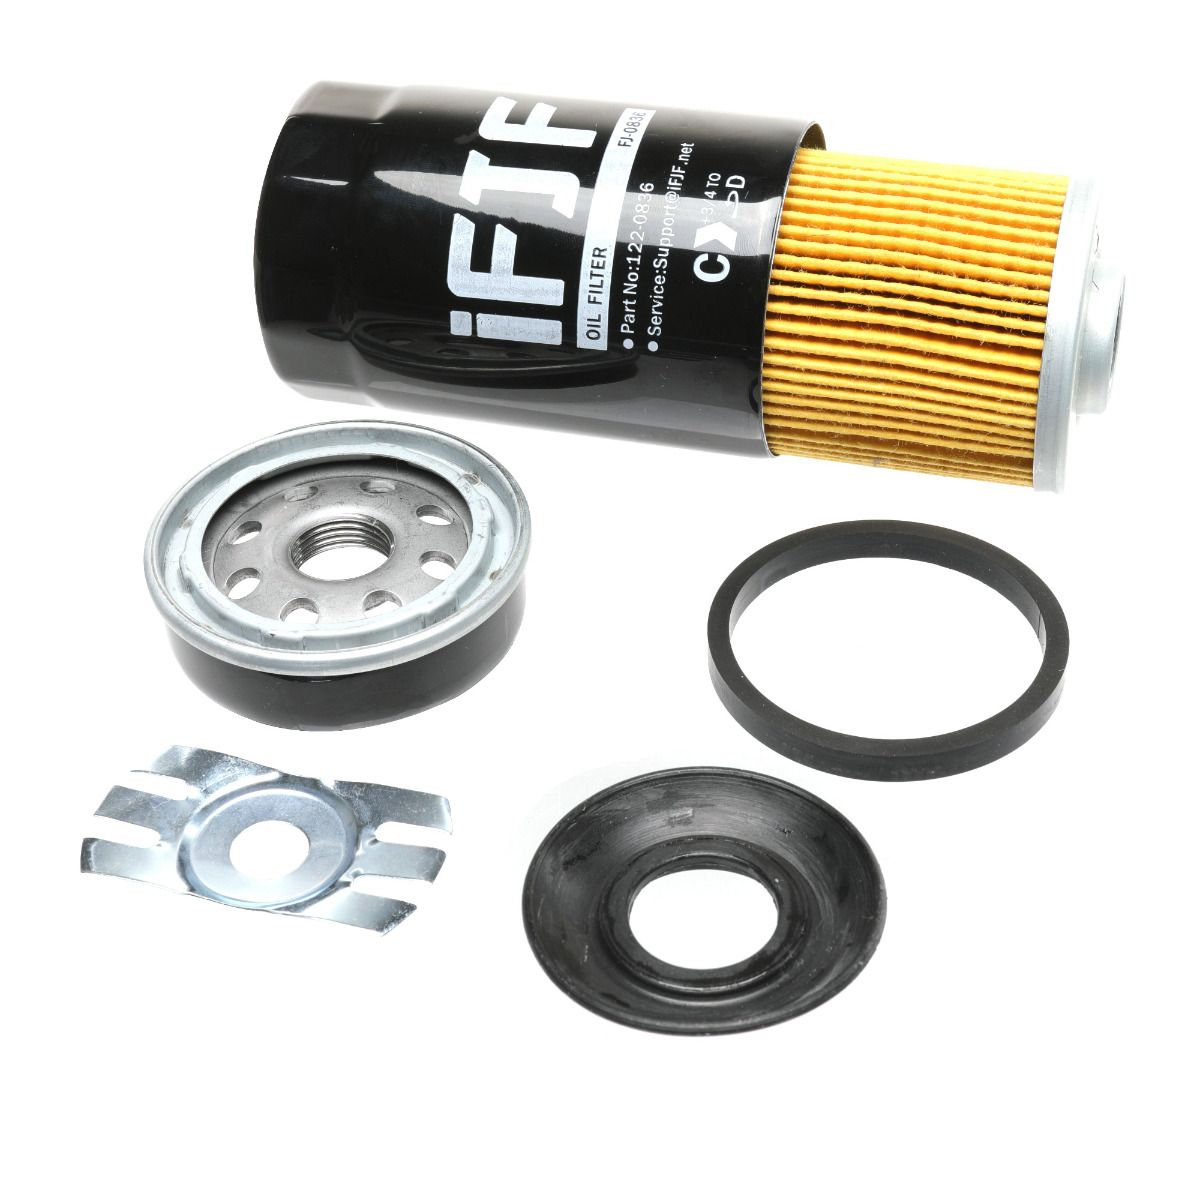 122-0836 Oil Filter for HGJAA HGJAB HGJAC Cummins Onan Generator